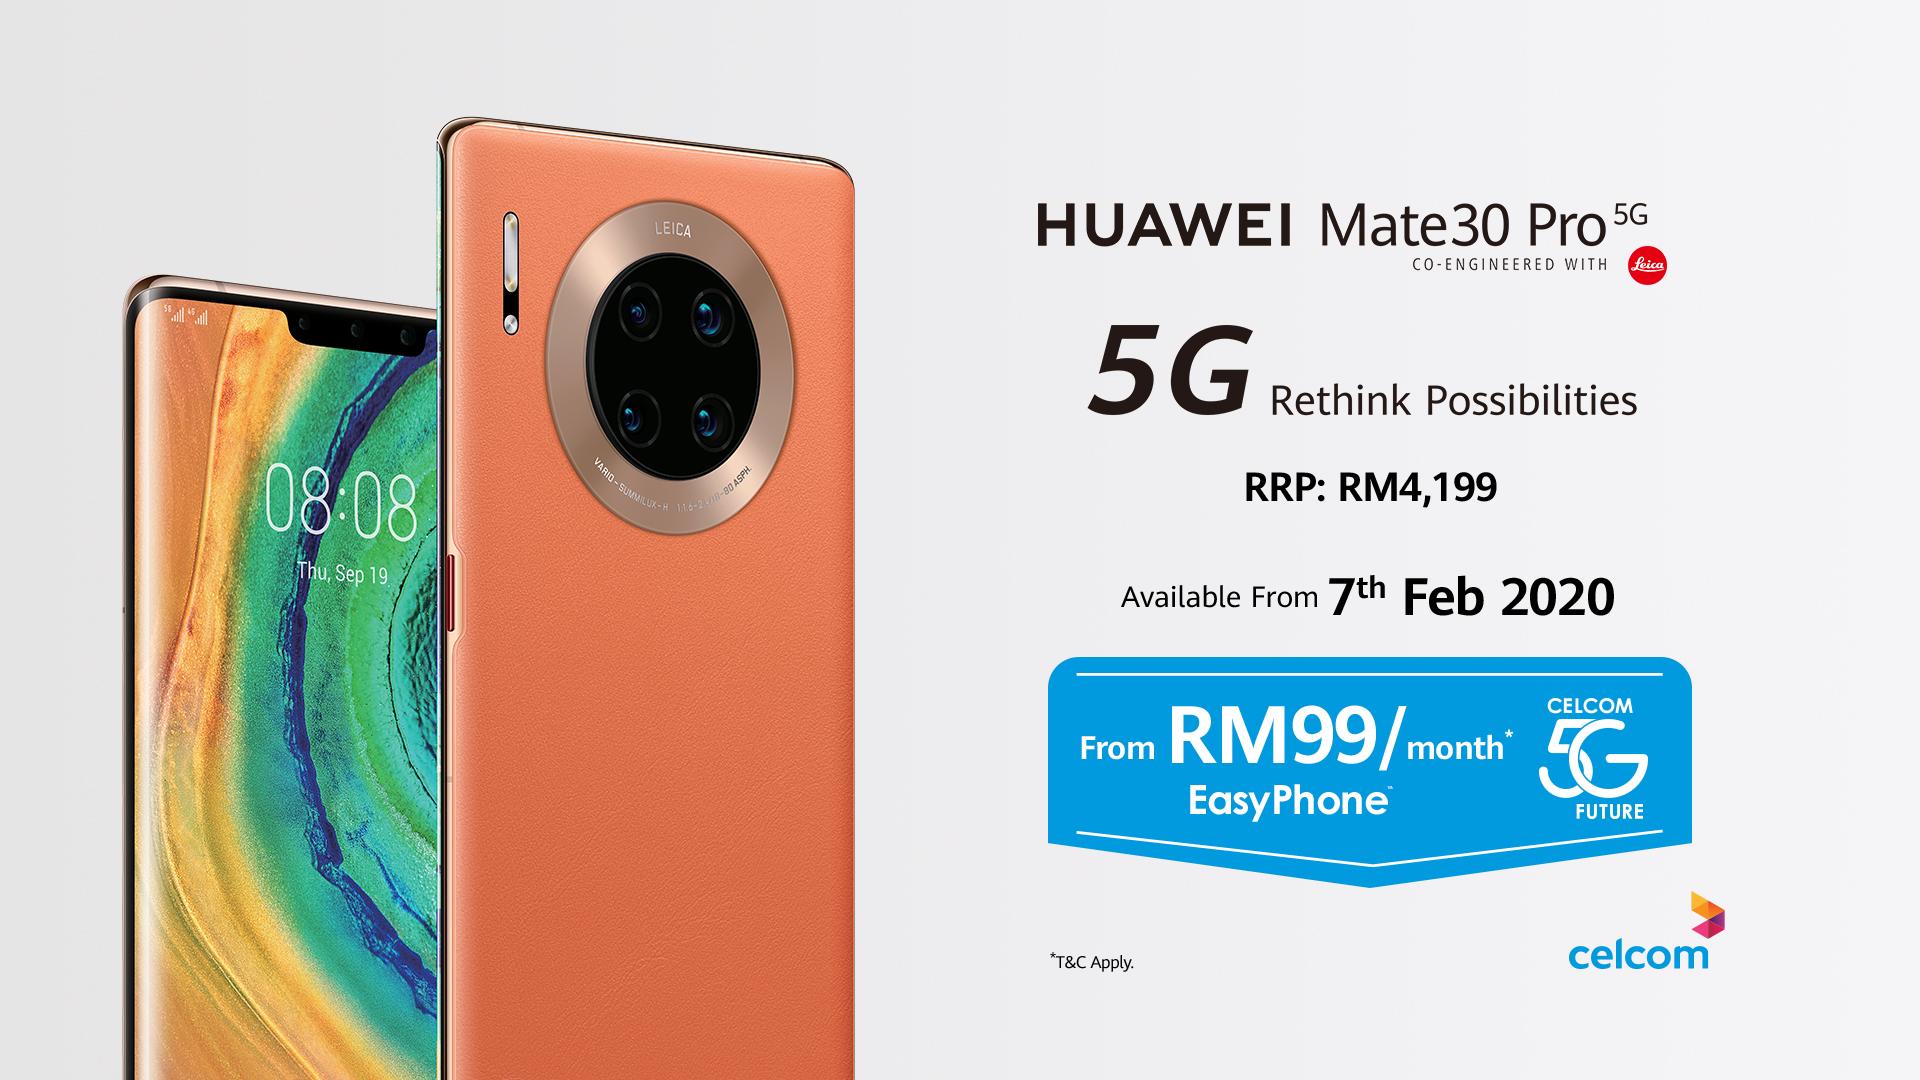 Mate30 Pro 5G celcom